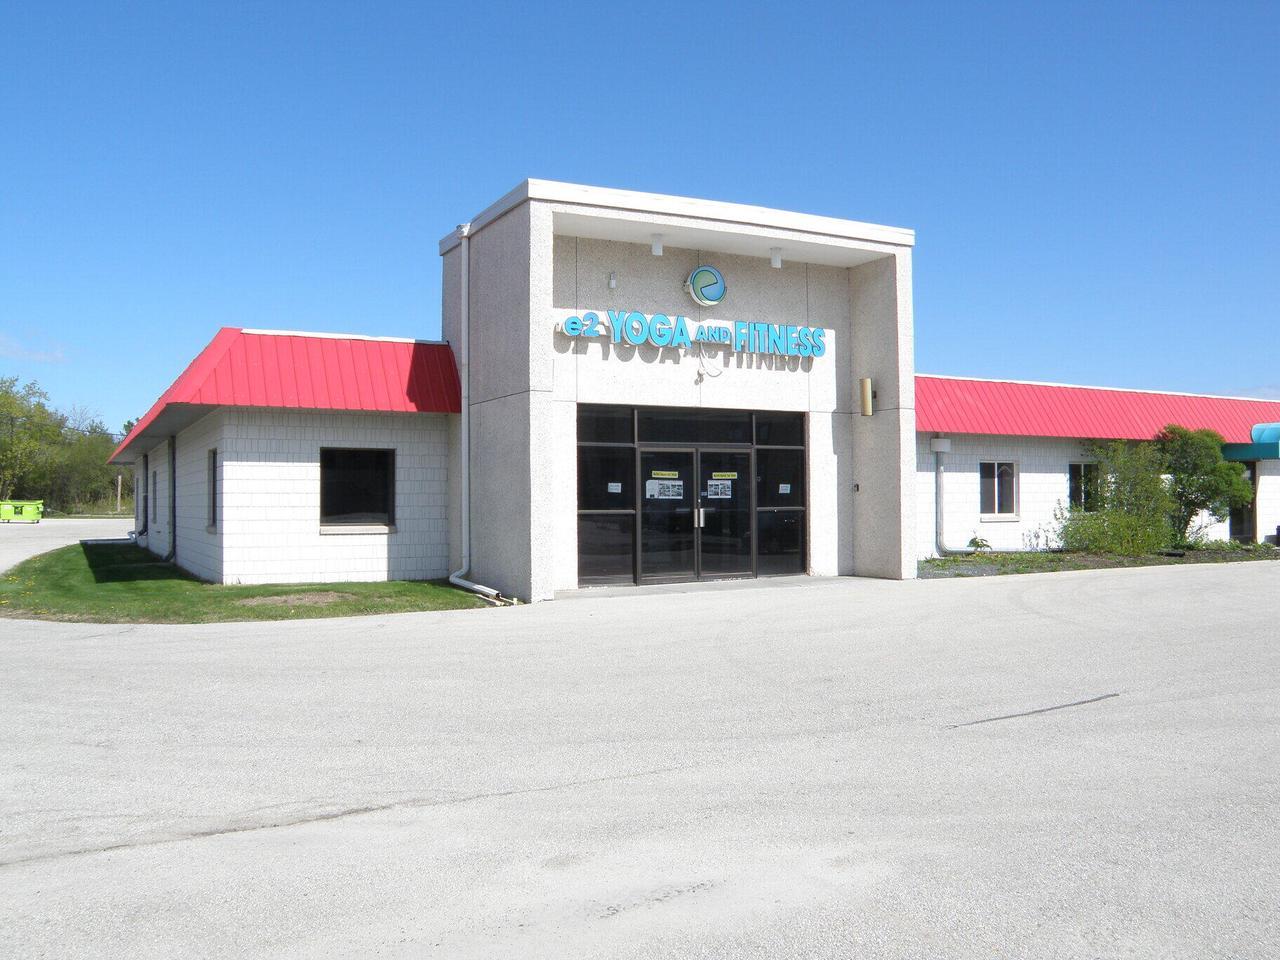 10510 N Port Washington Rd ROAD, MEQUON, WI 53092